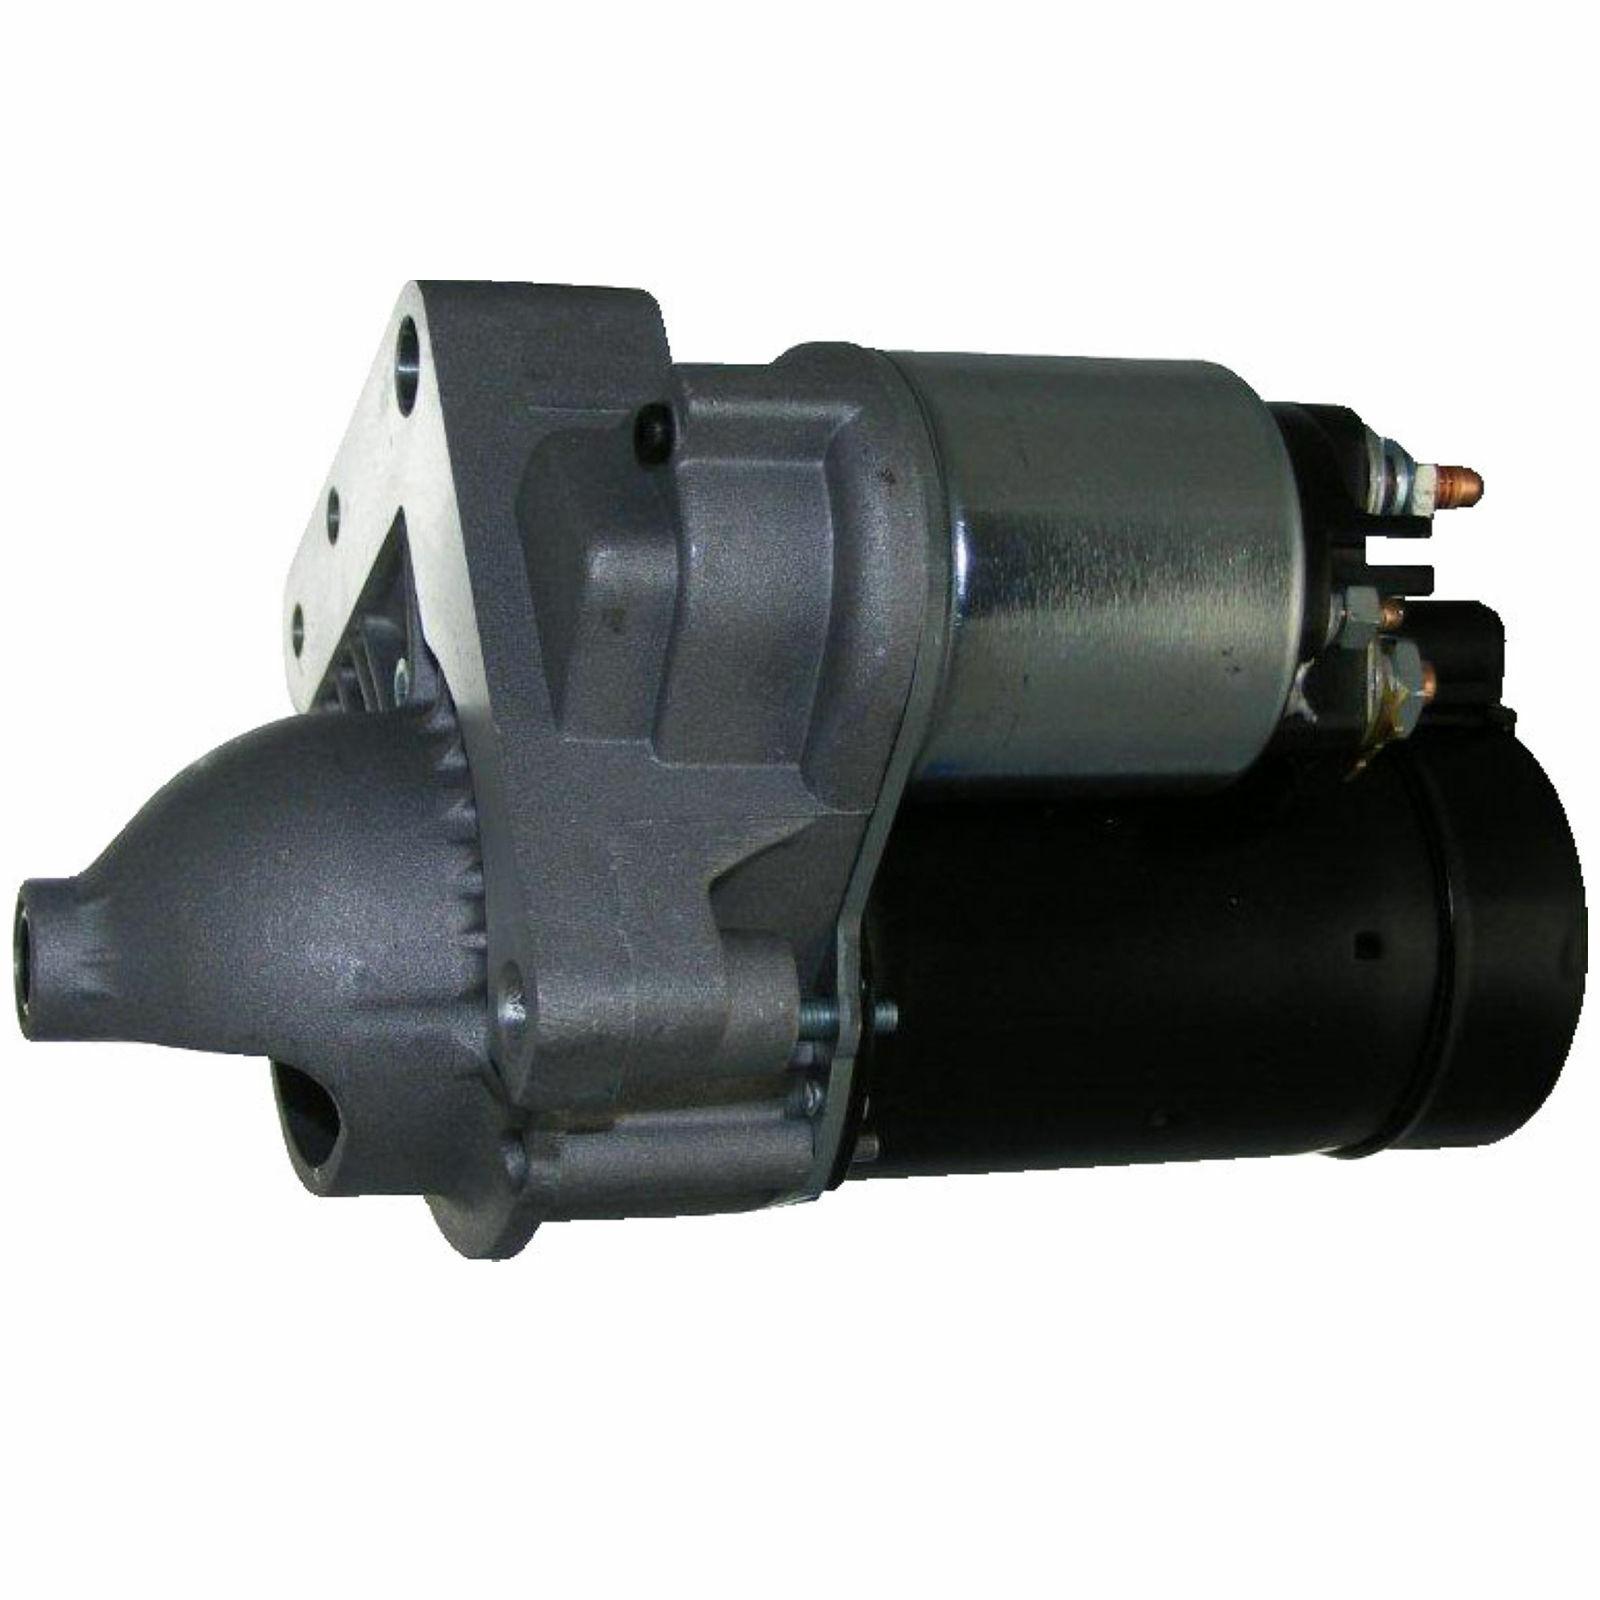 Starter Motor fits PEUGEOT 1007//107//206//207//208//307 1.4 HDi DIESEL MODELS